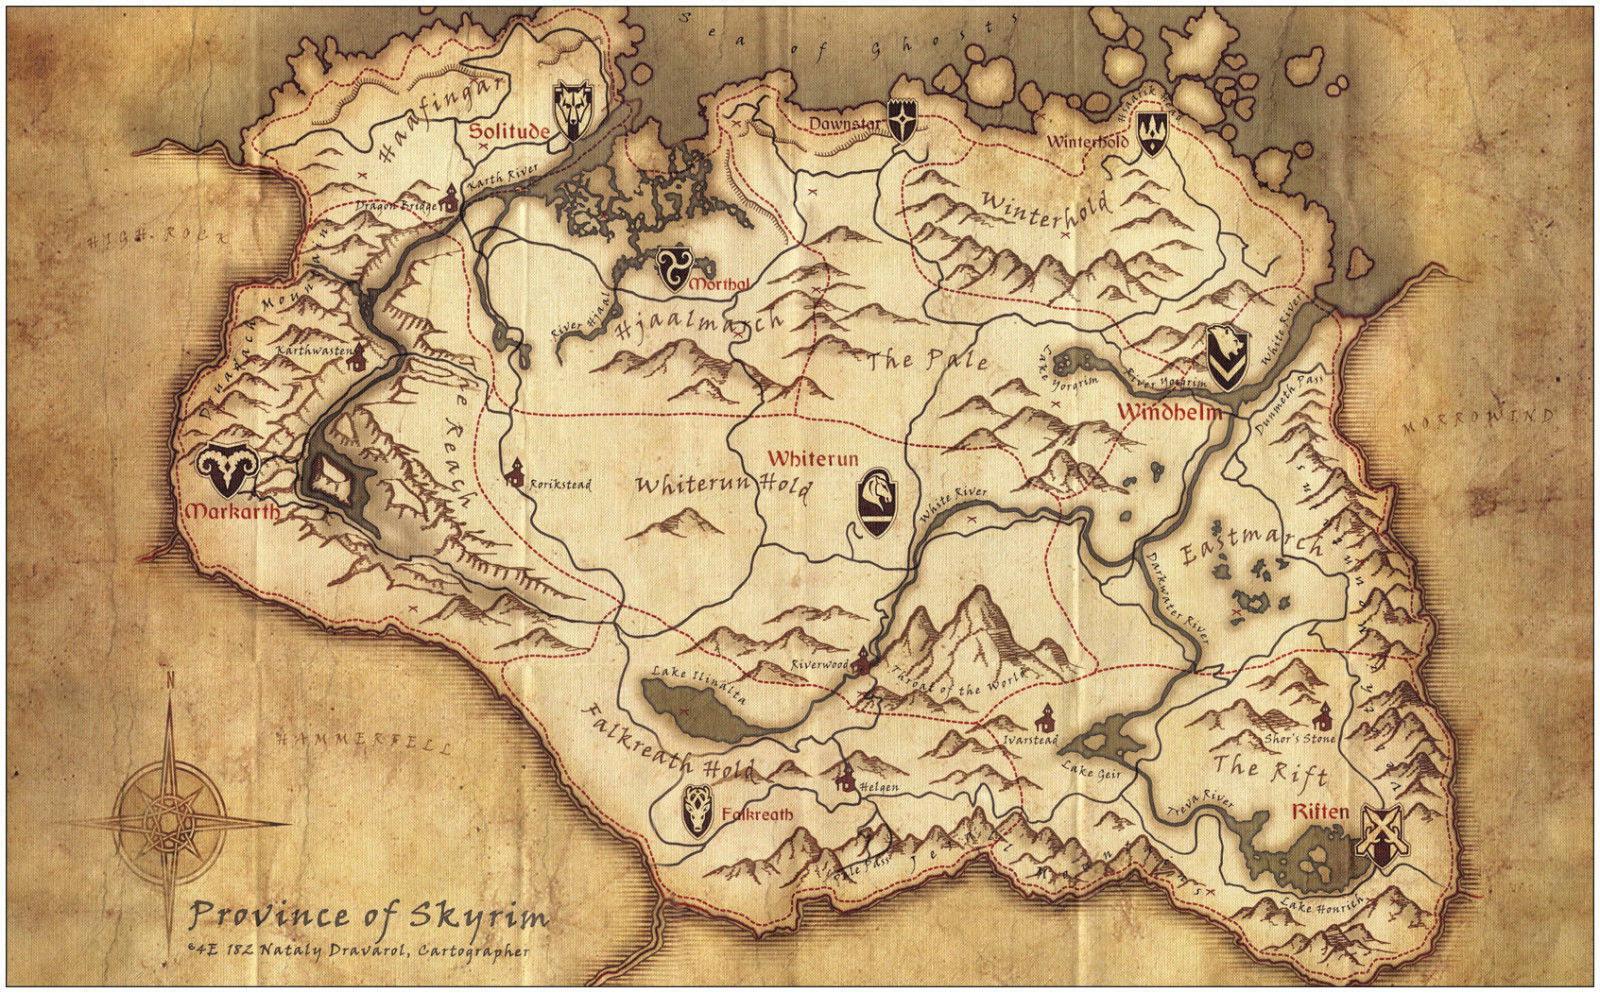 62918 Skyrim Elder Scrolls Map Decor Wall Print Poster | eBay